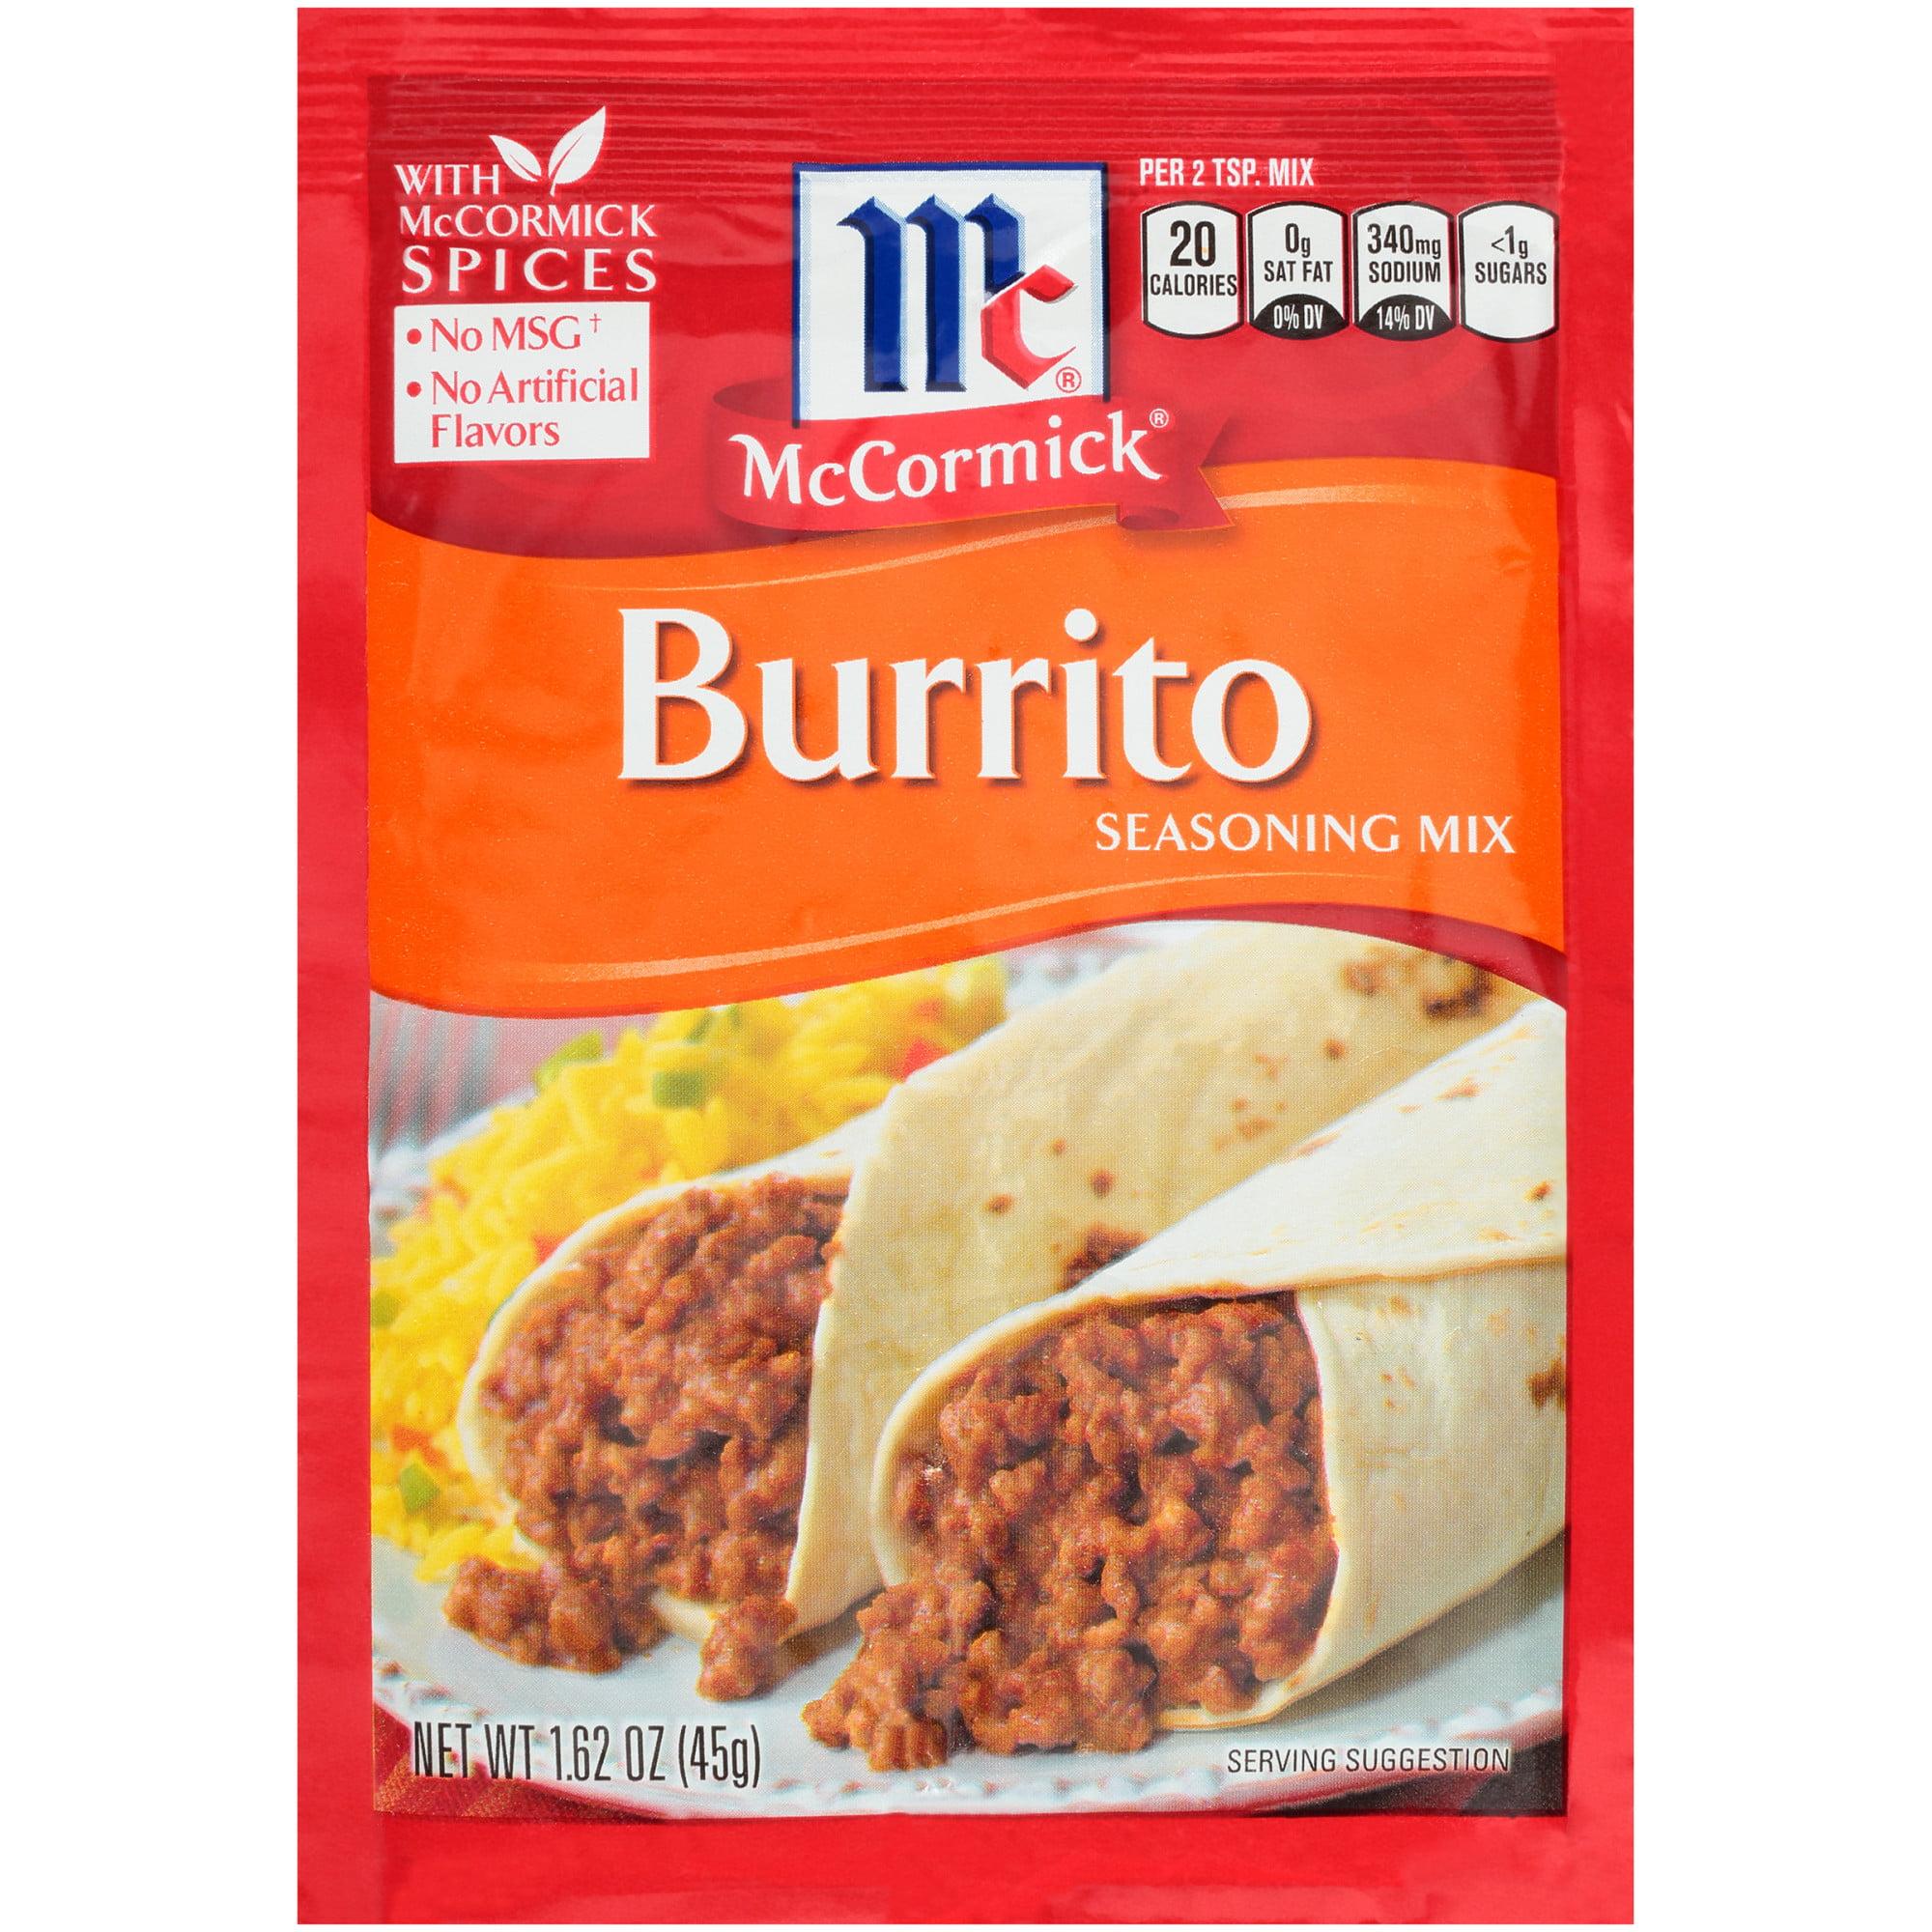 McCormick Burrito Seasoning Mix, 1 62 oz